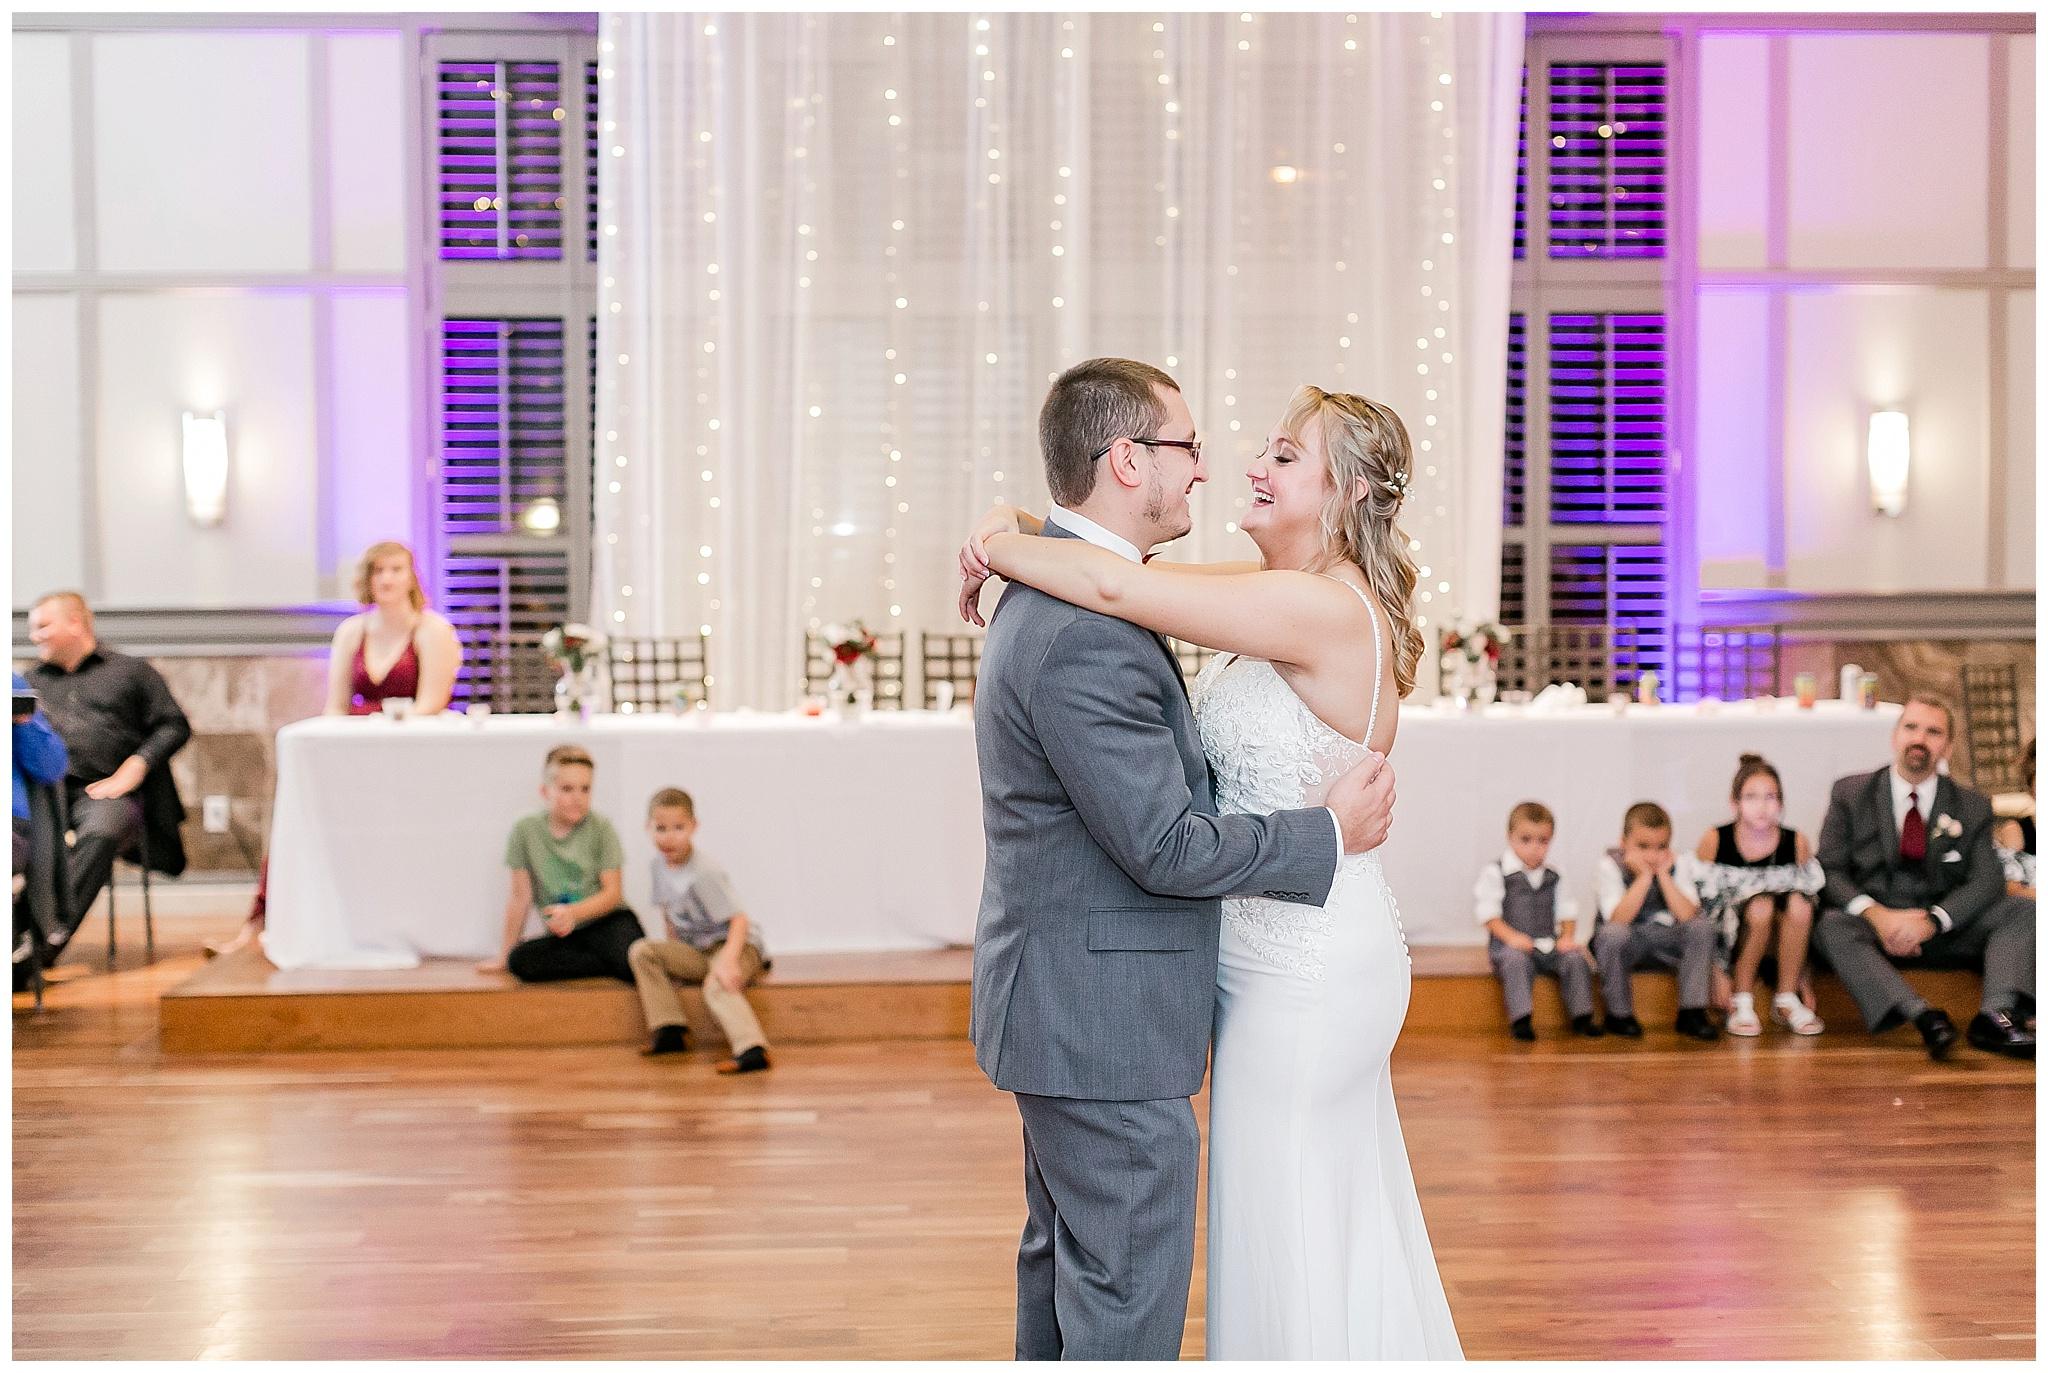 noahs_event_venue_sun_pairie_madison_wisconsin_wedding_photographers_0318.jpg